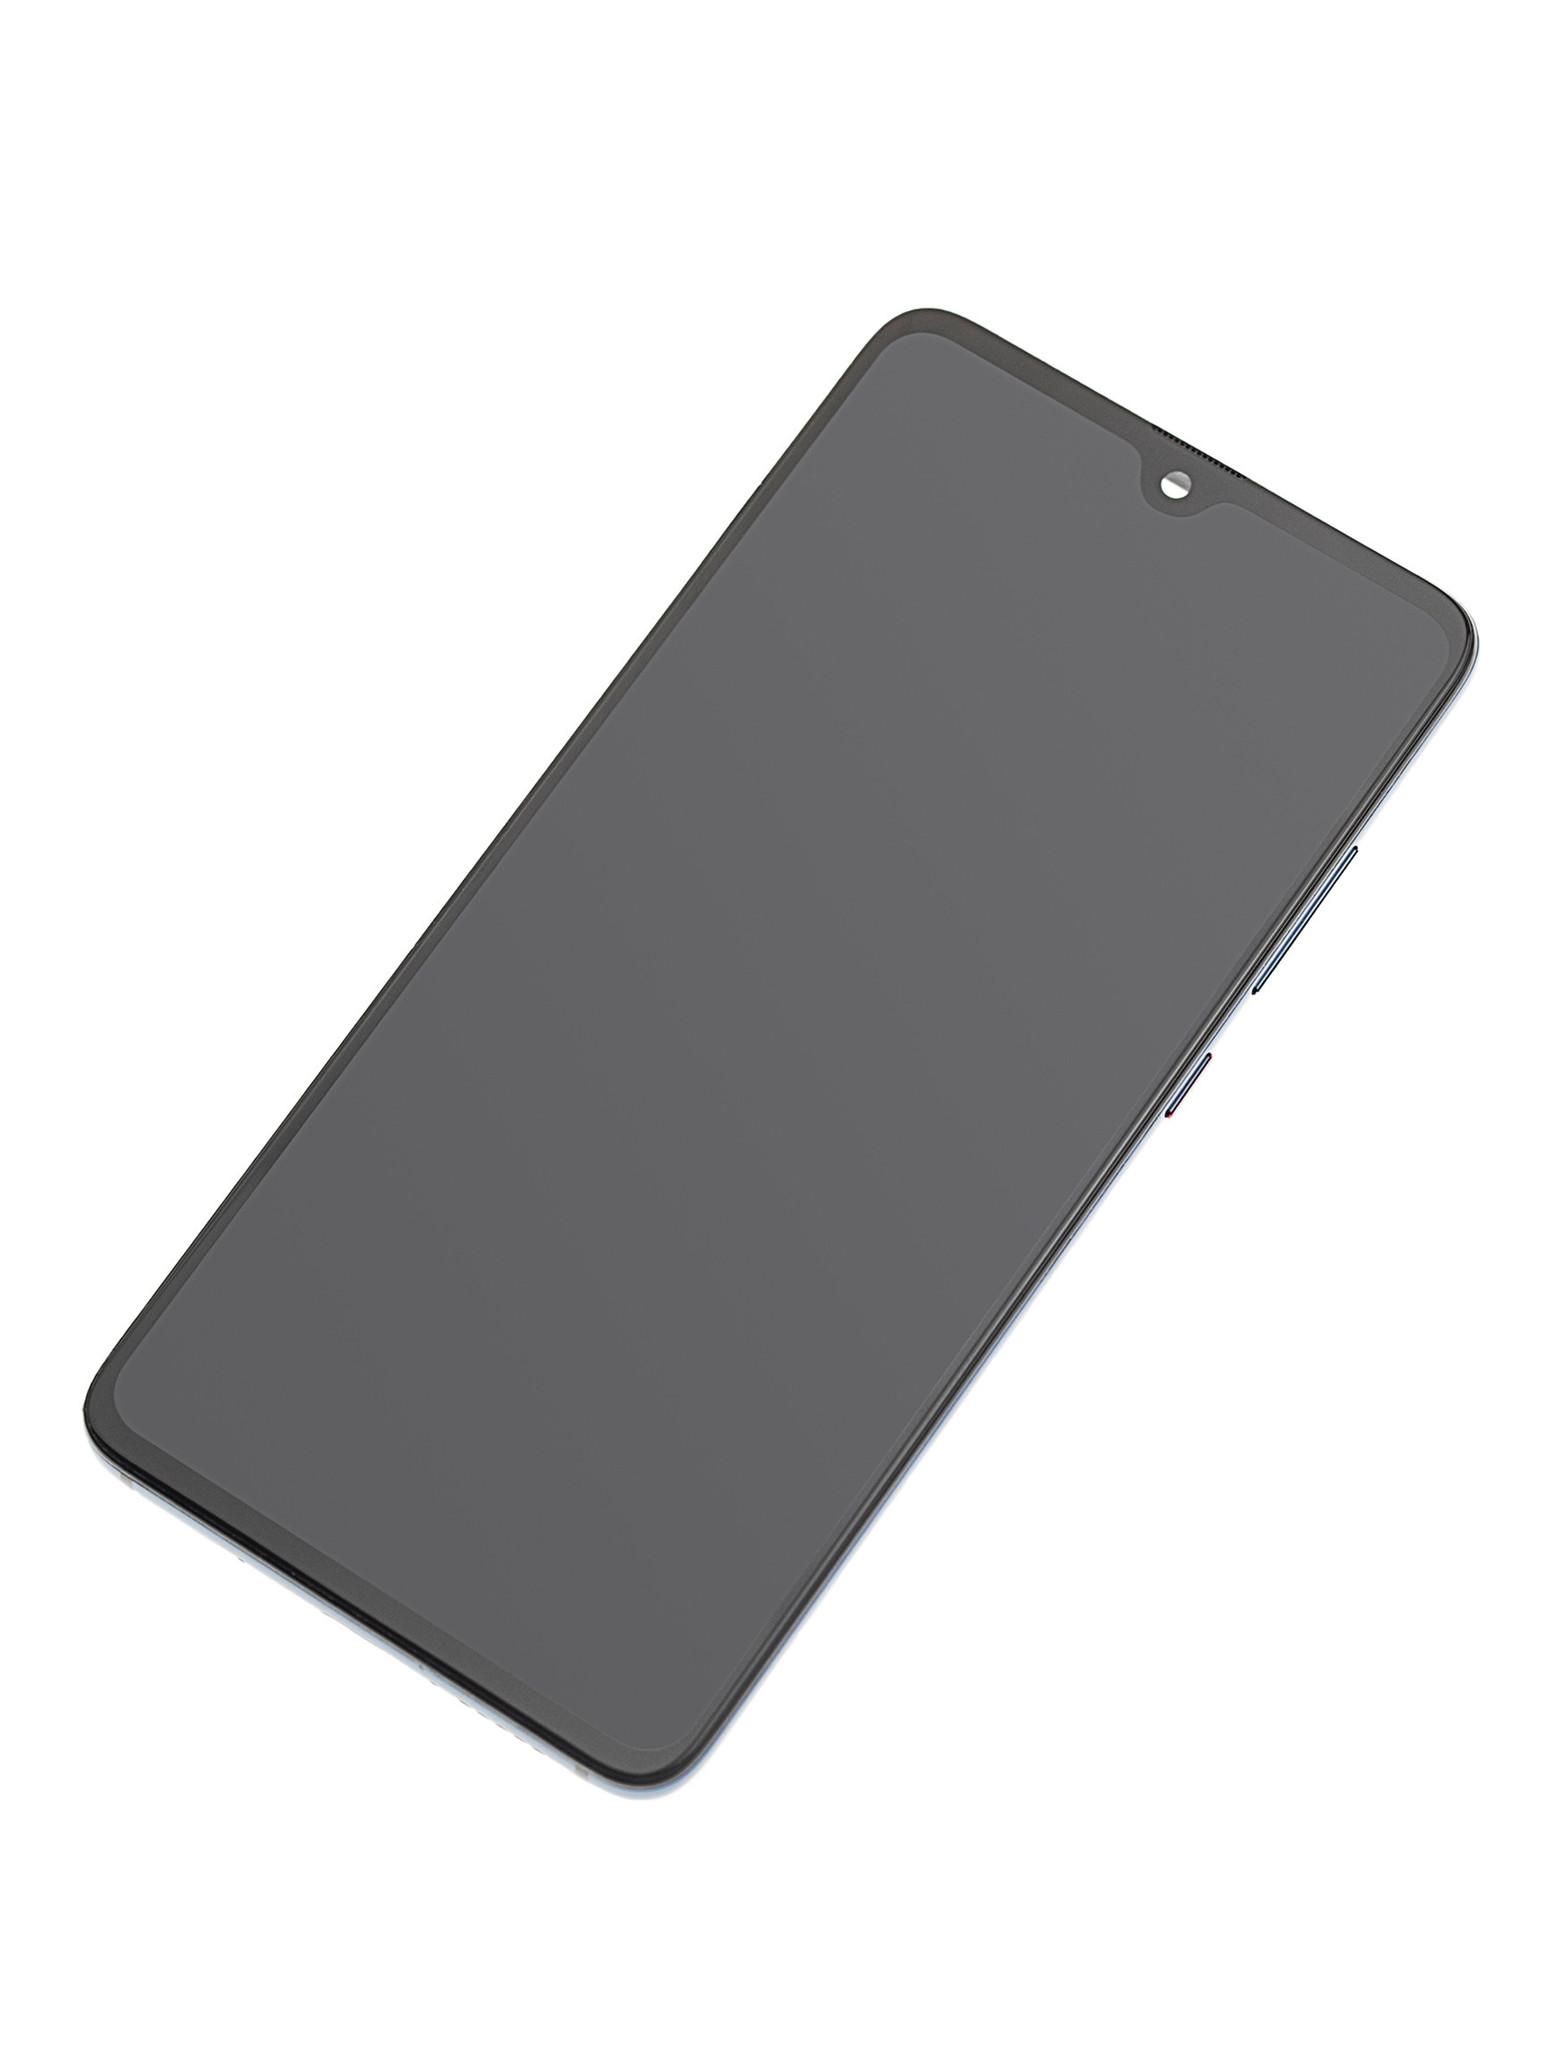 Huawei Mate 20 HMA-L29 Display Module + Frame Blue